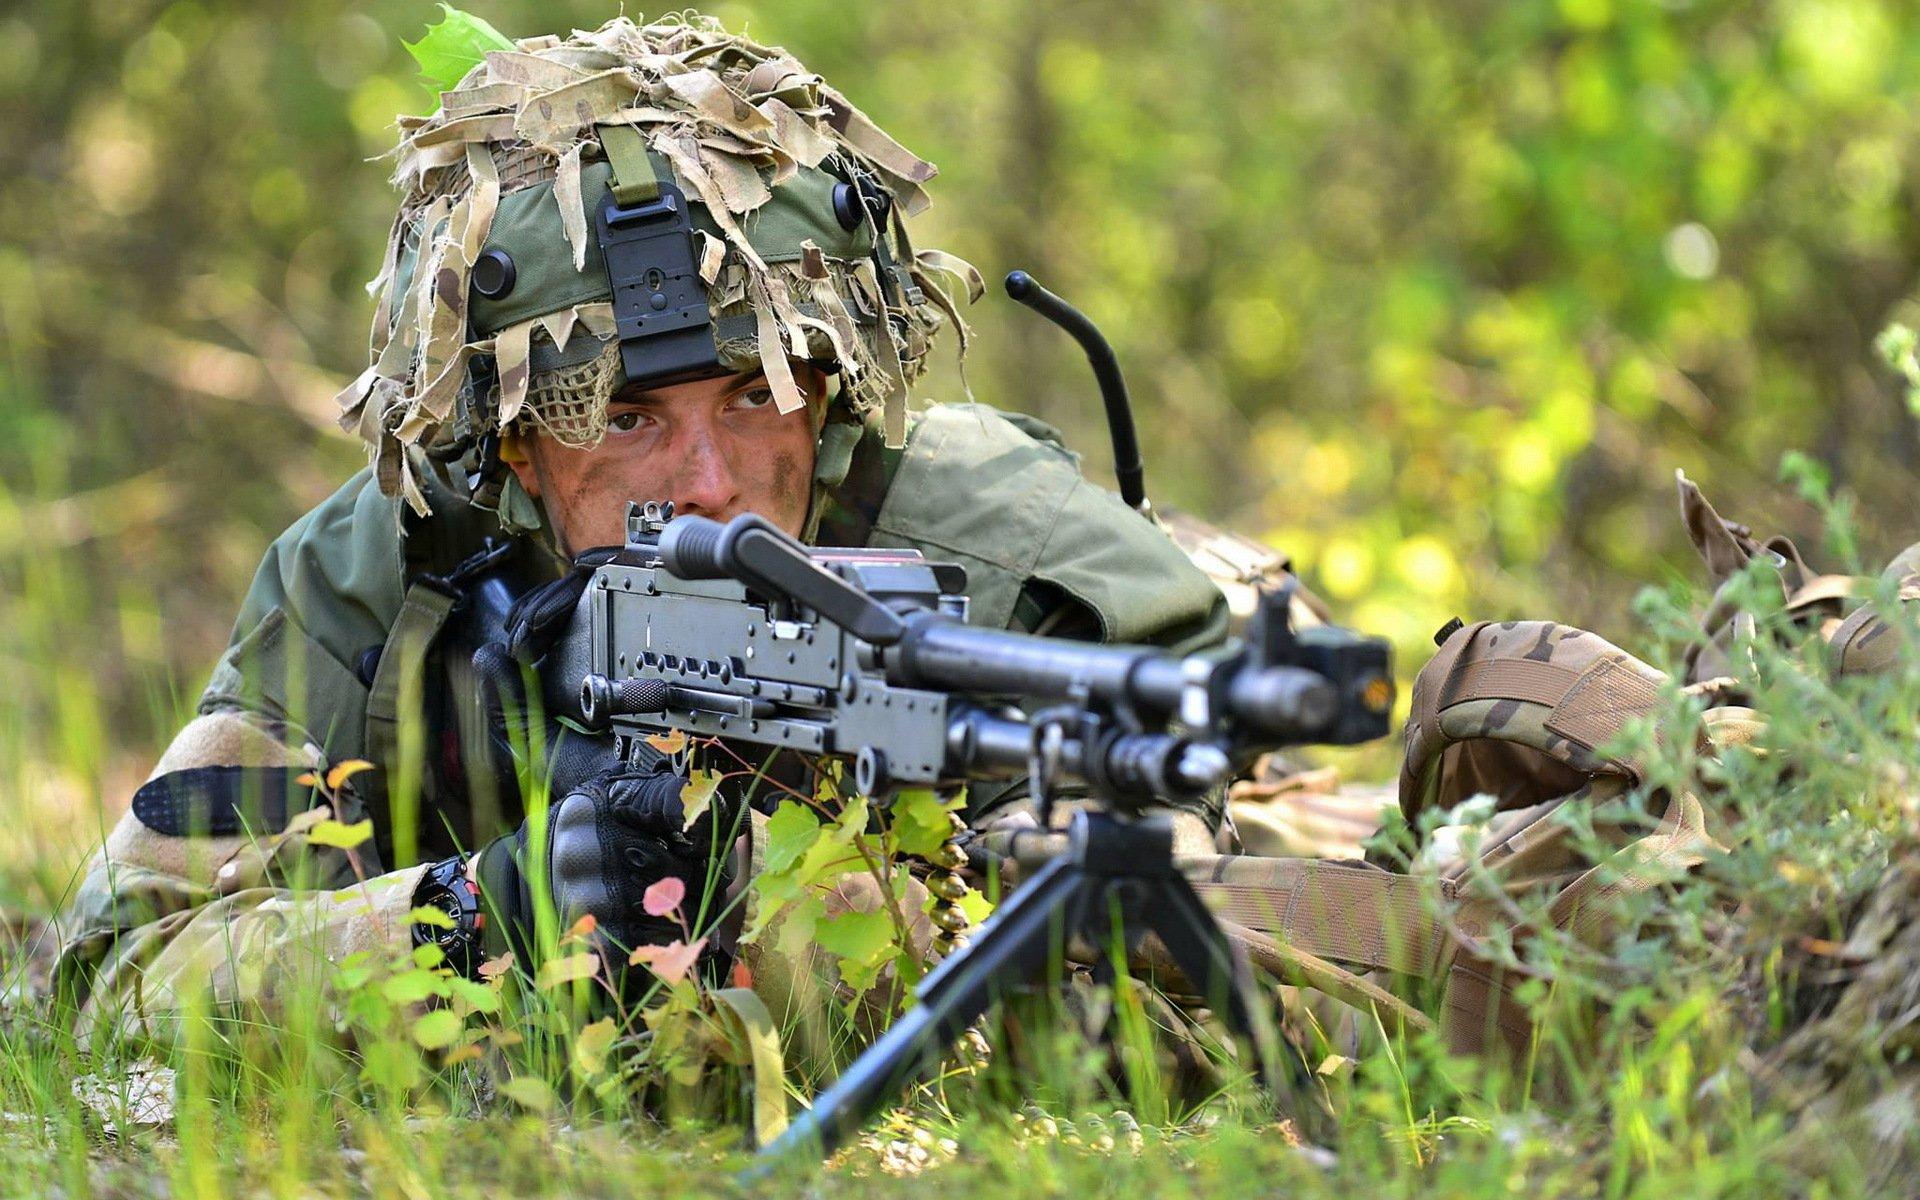 Красивые армейские картинки